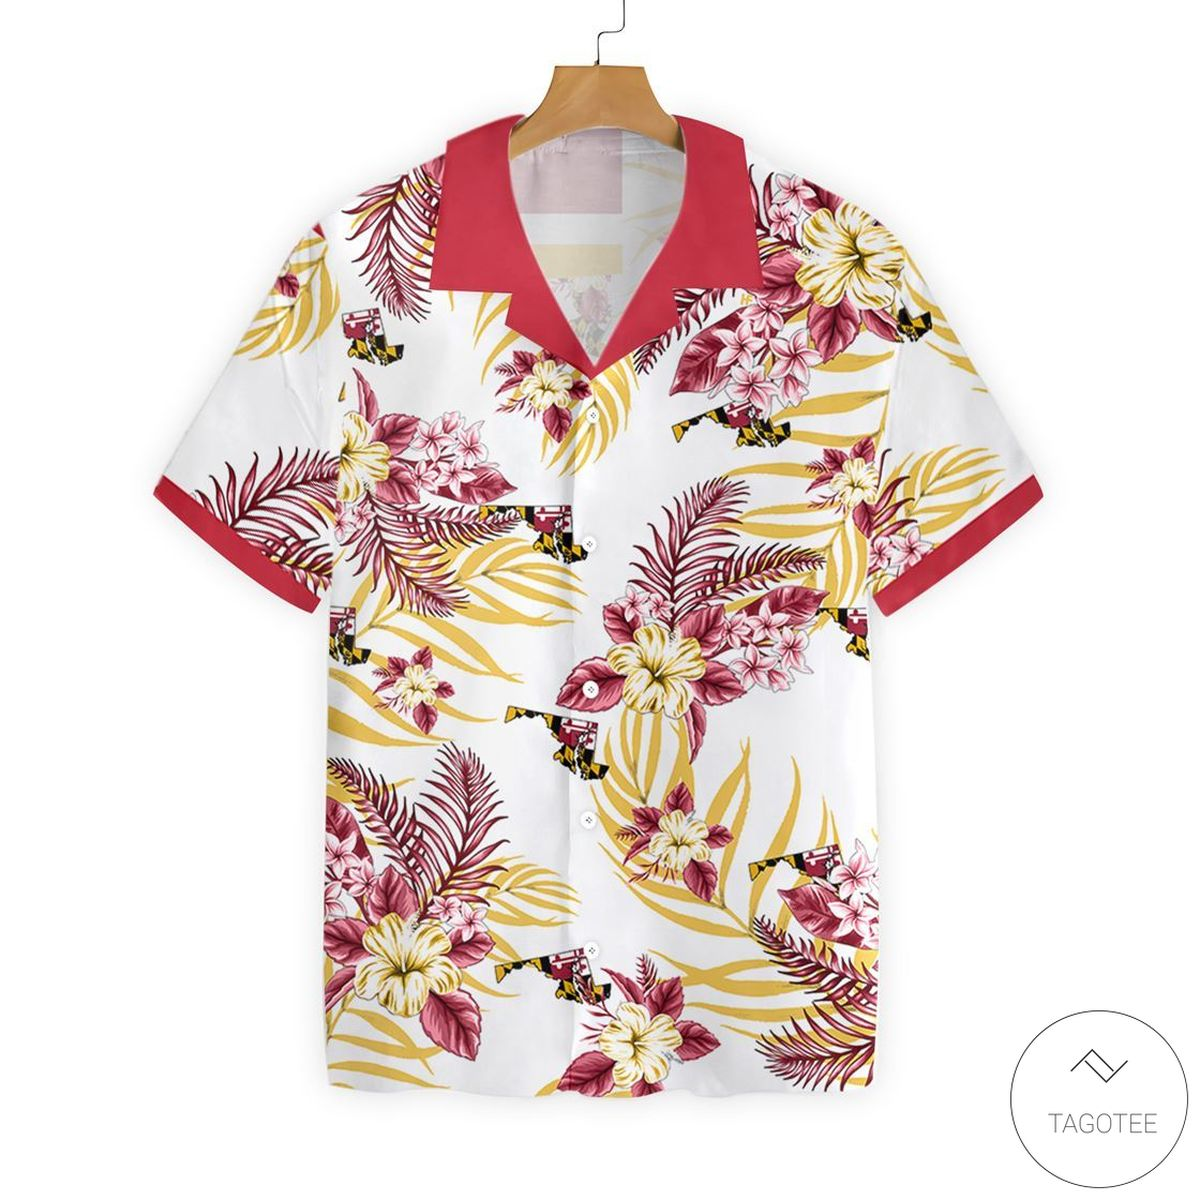 Maryland Proud Button Hawaiian Shirt